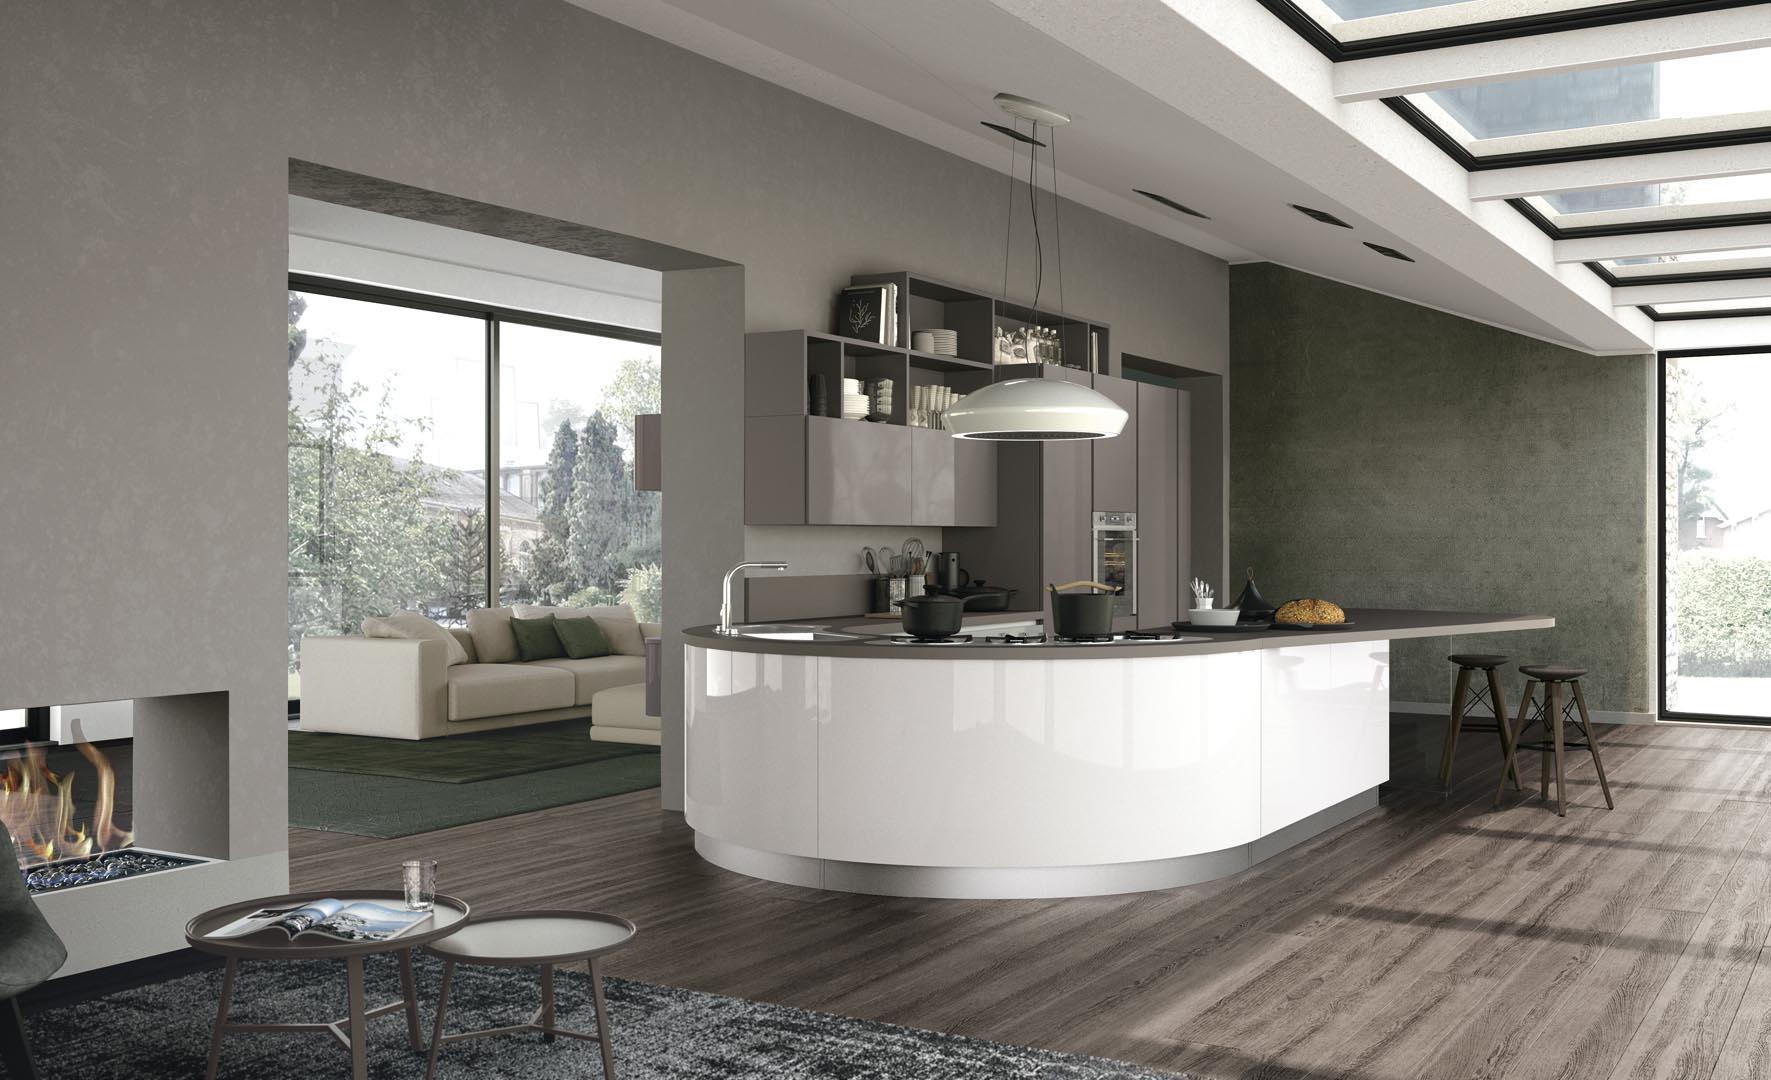 Cucine moderne nuovarreda barbiero - Cucine moderne lube ...